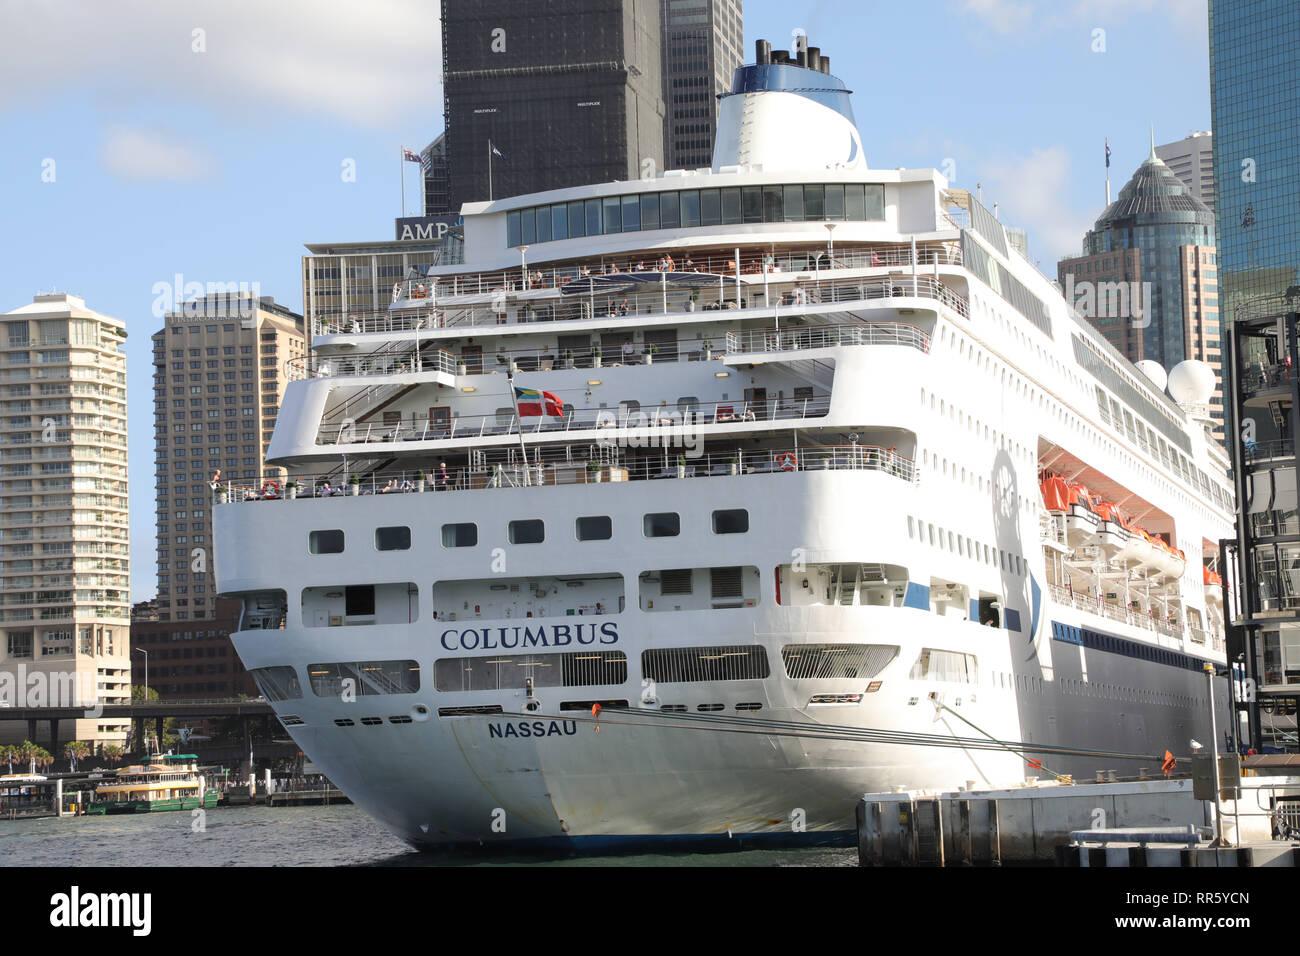 Cruise & Maritime Voyages' MV Columbus cruise ship moored at the Overseas Passenger Terminal in Sydney, Australia. - Stock Image